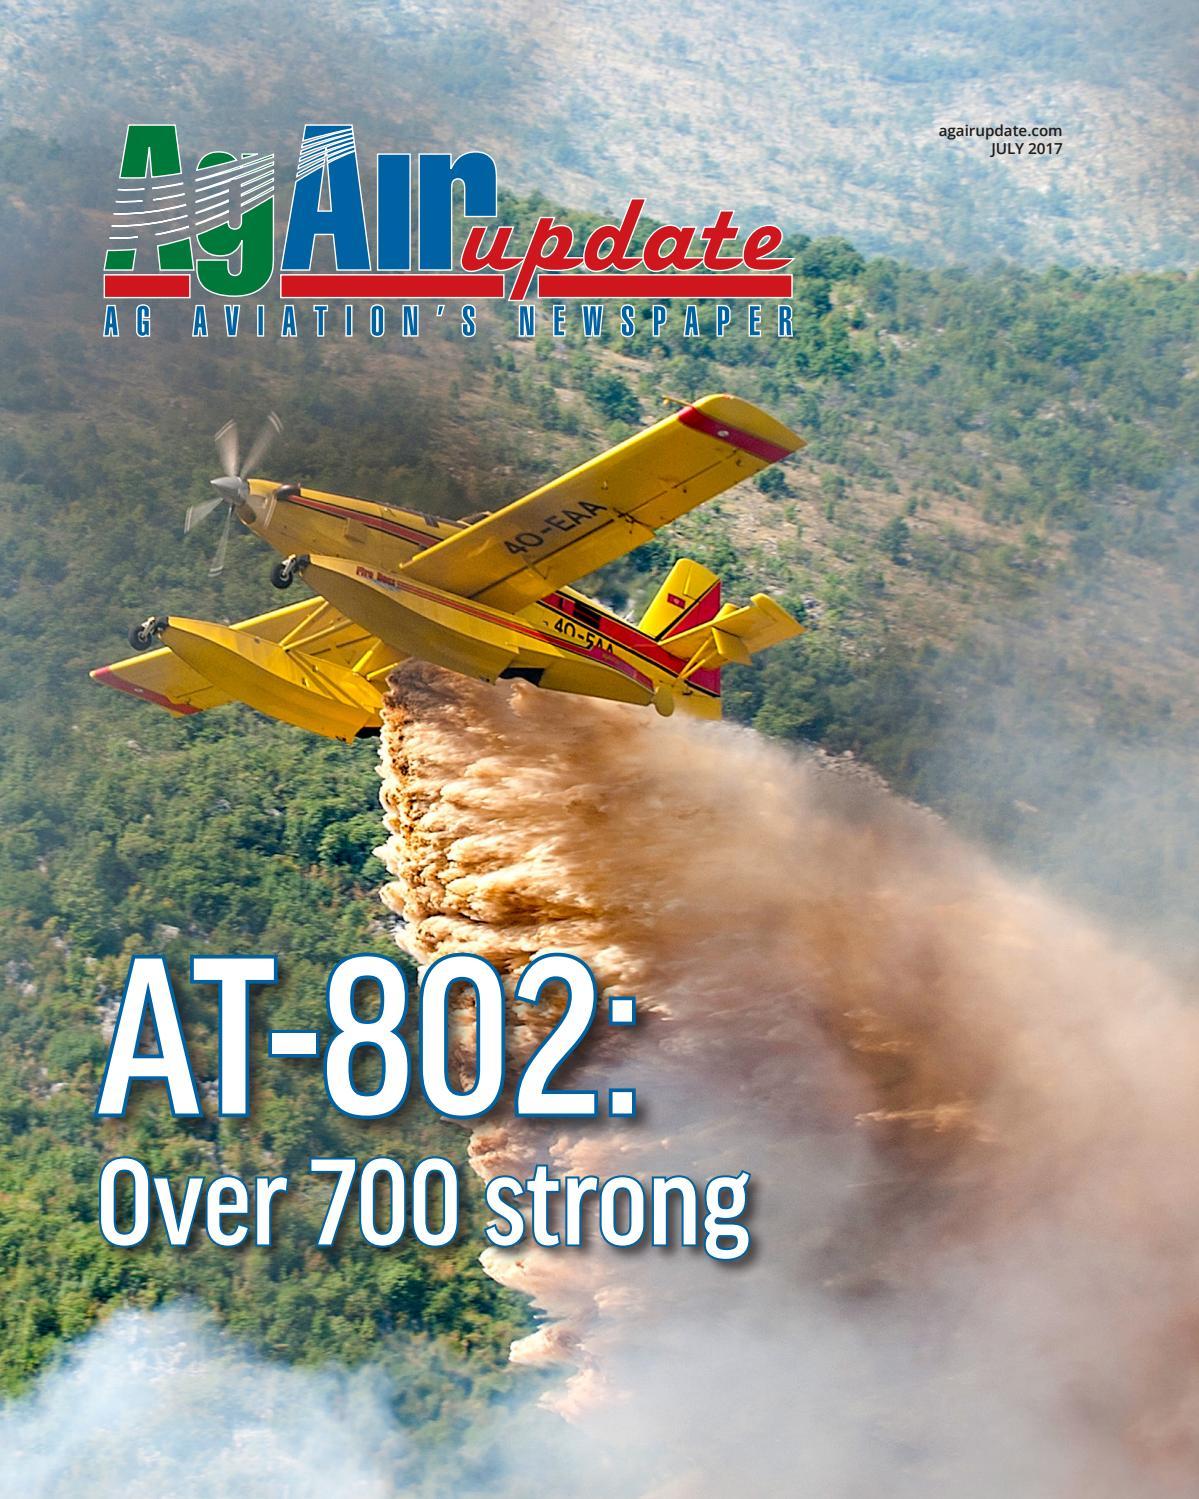 Pratt Whitney R985 R1340 Radial Aircraft Engine Covers 2 ea New Stearman SNJ